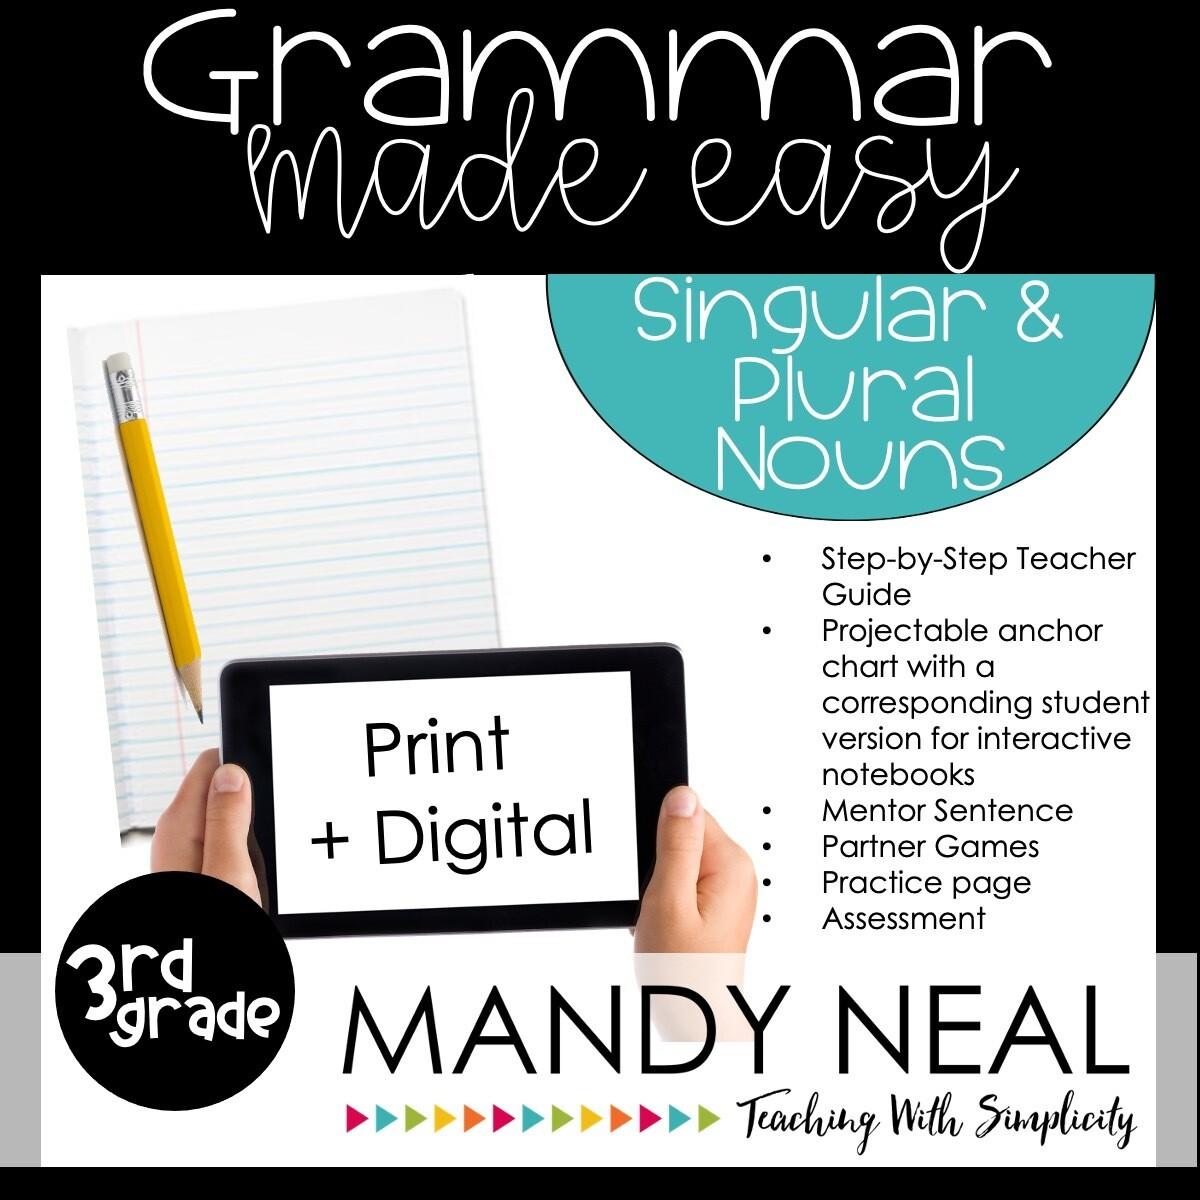 Print + Digital Third Grade Grammar Activities (Singular & Plural Nouns)